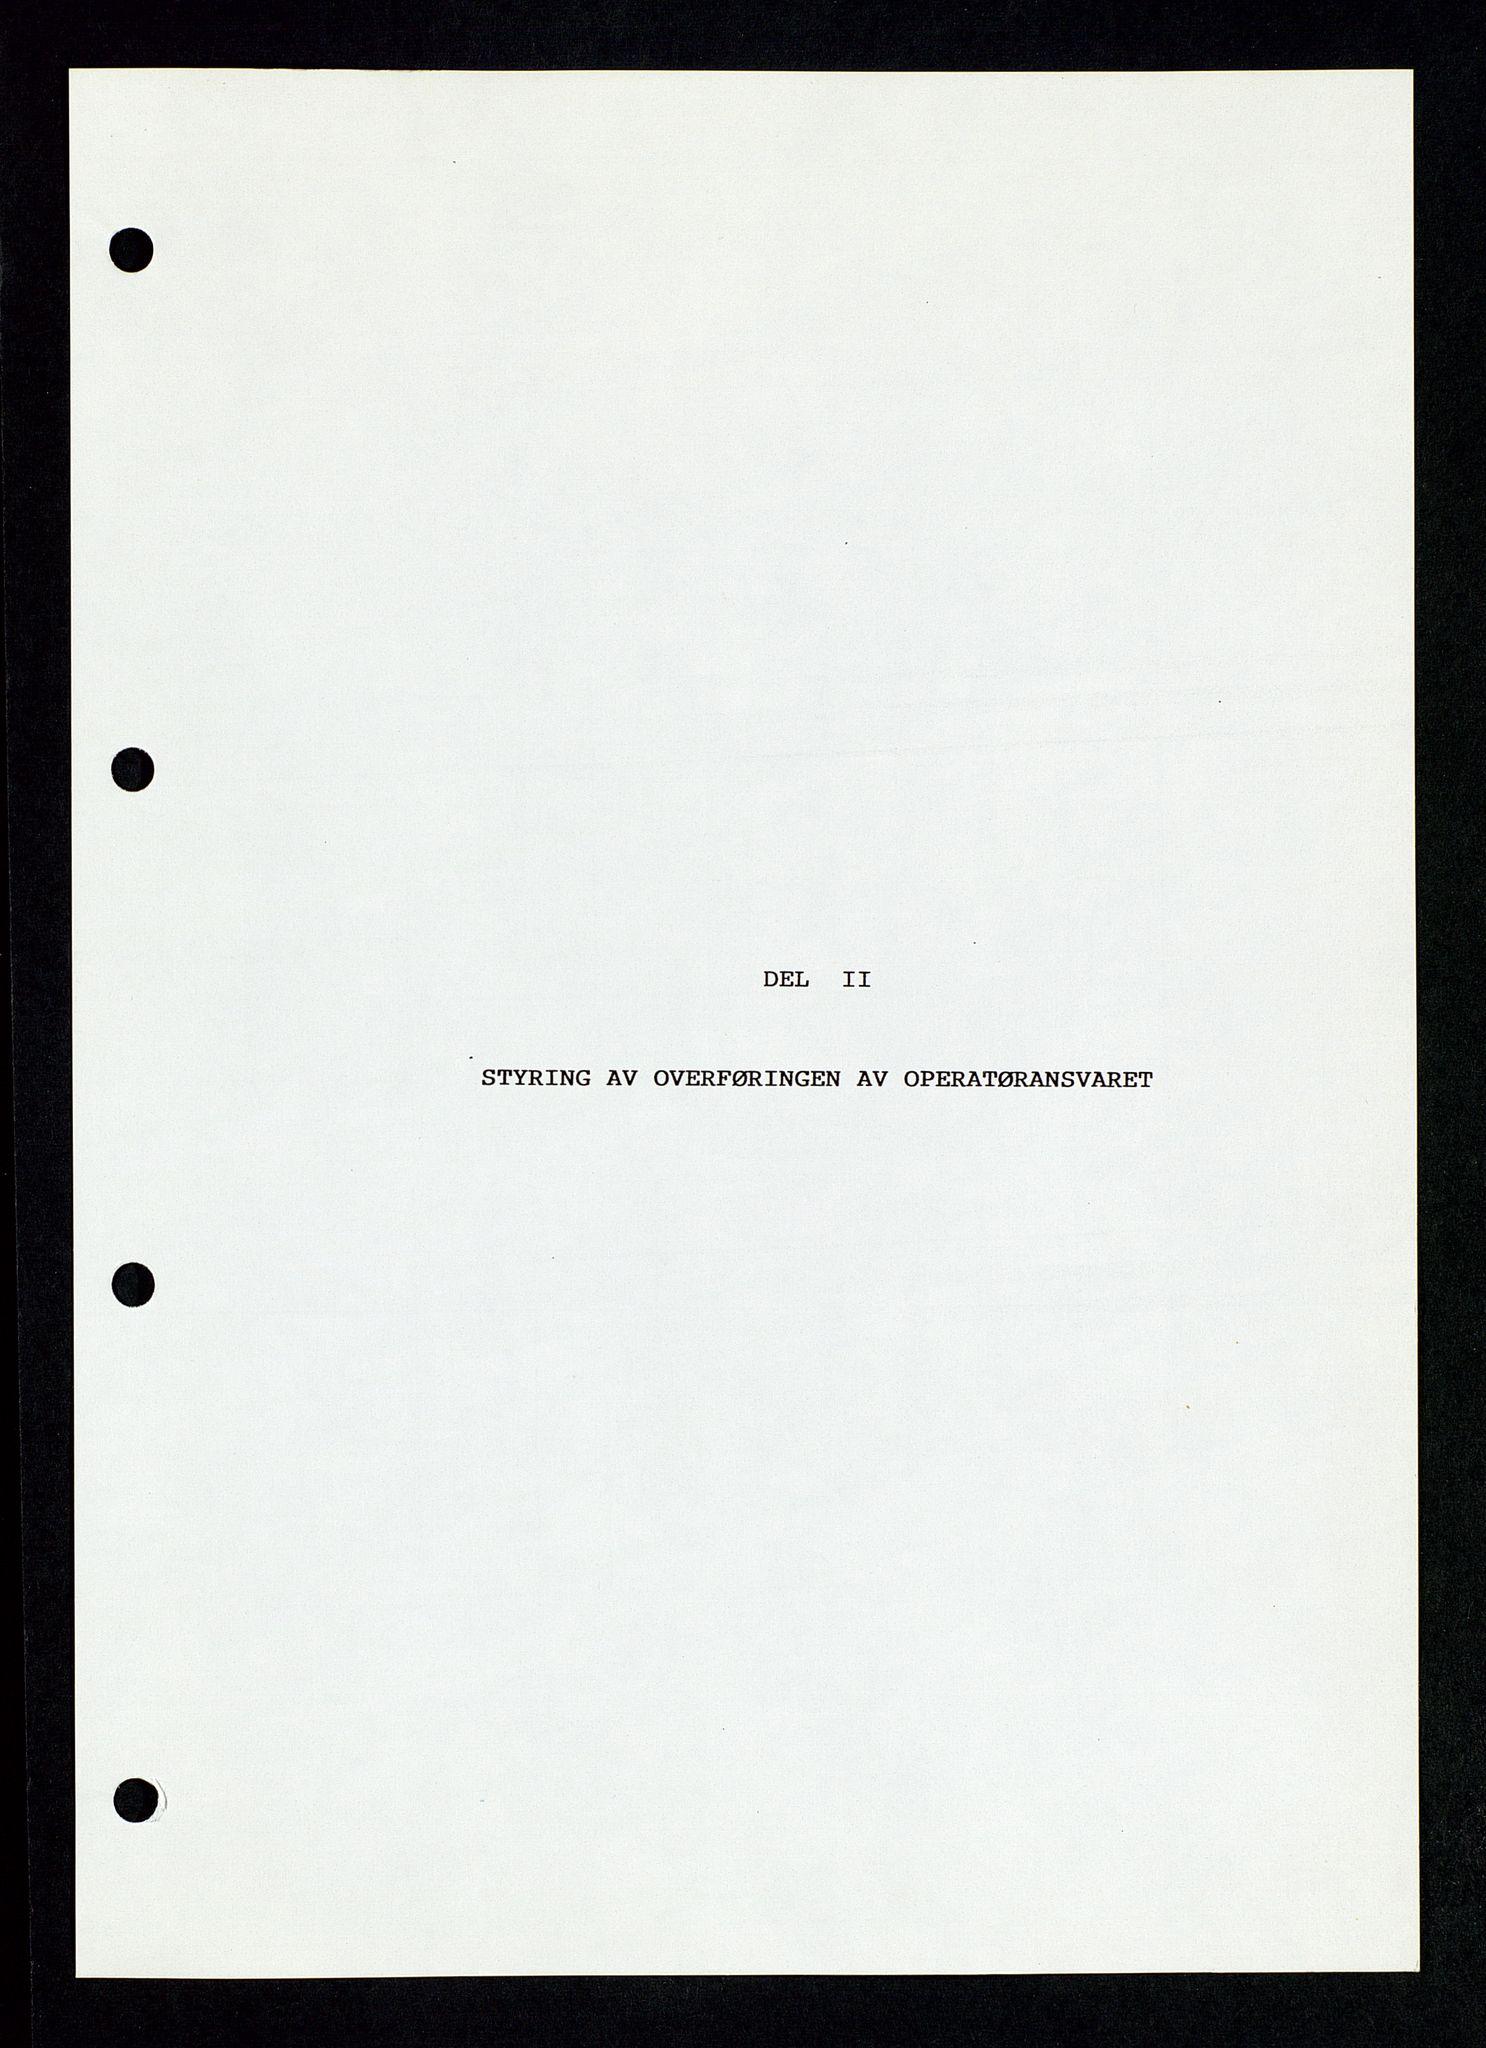 SAST, Pa 1339 - Statoil ASA, D/Dm/L0123: Rapporter, 1985-1988, s. 15